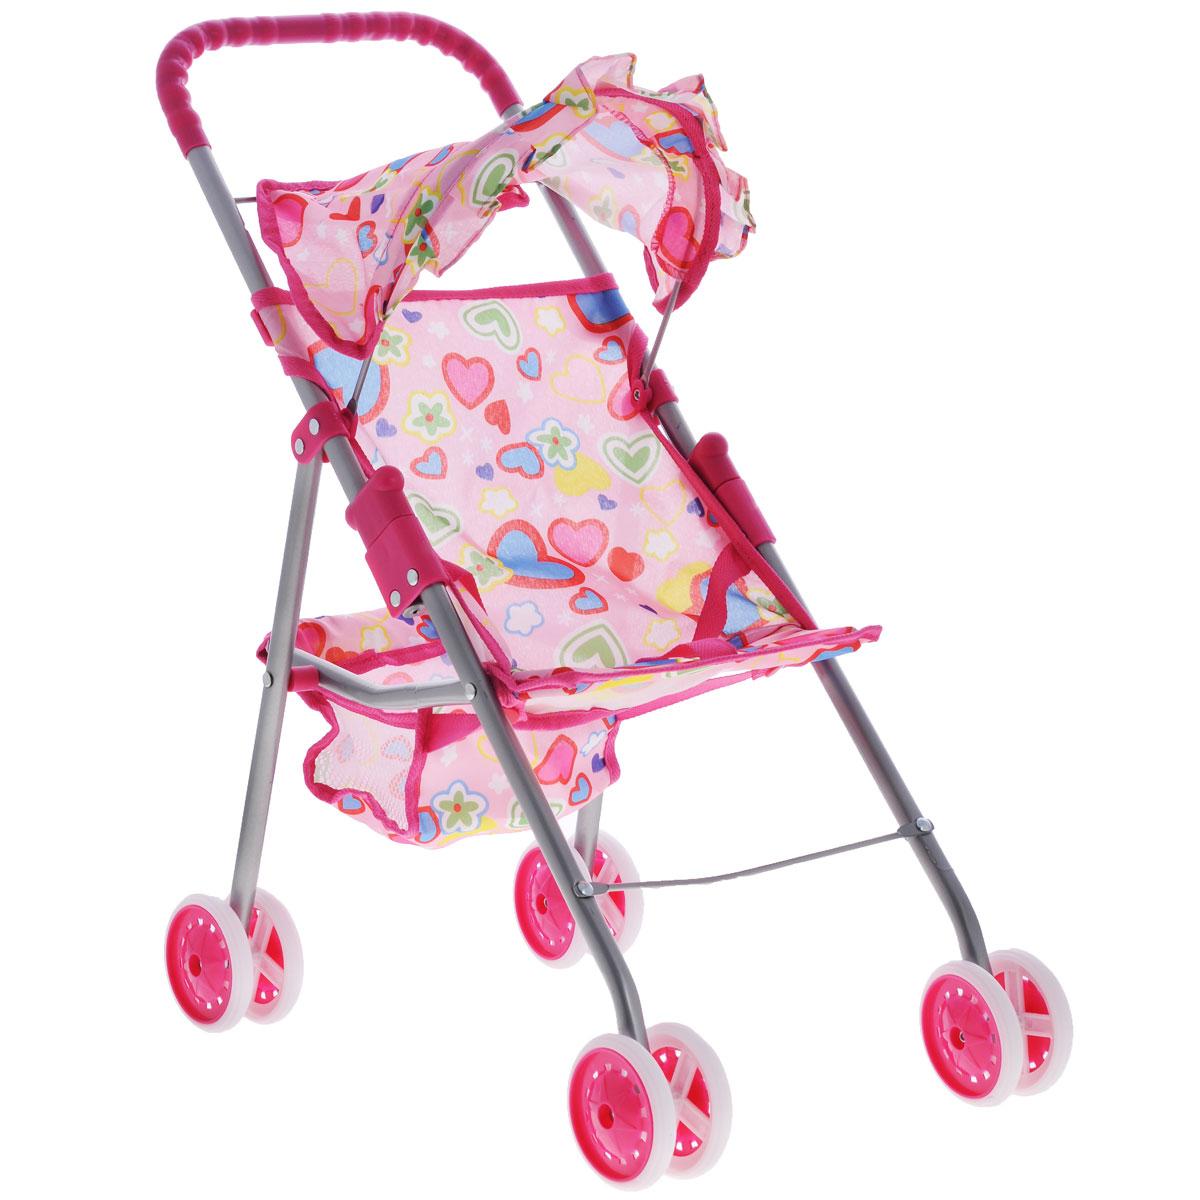 "Прогулочная коляска для кукол ""Melobo"", цвет: розовый с сердечками"